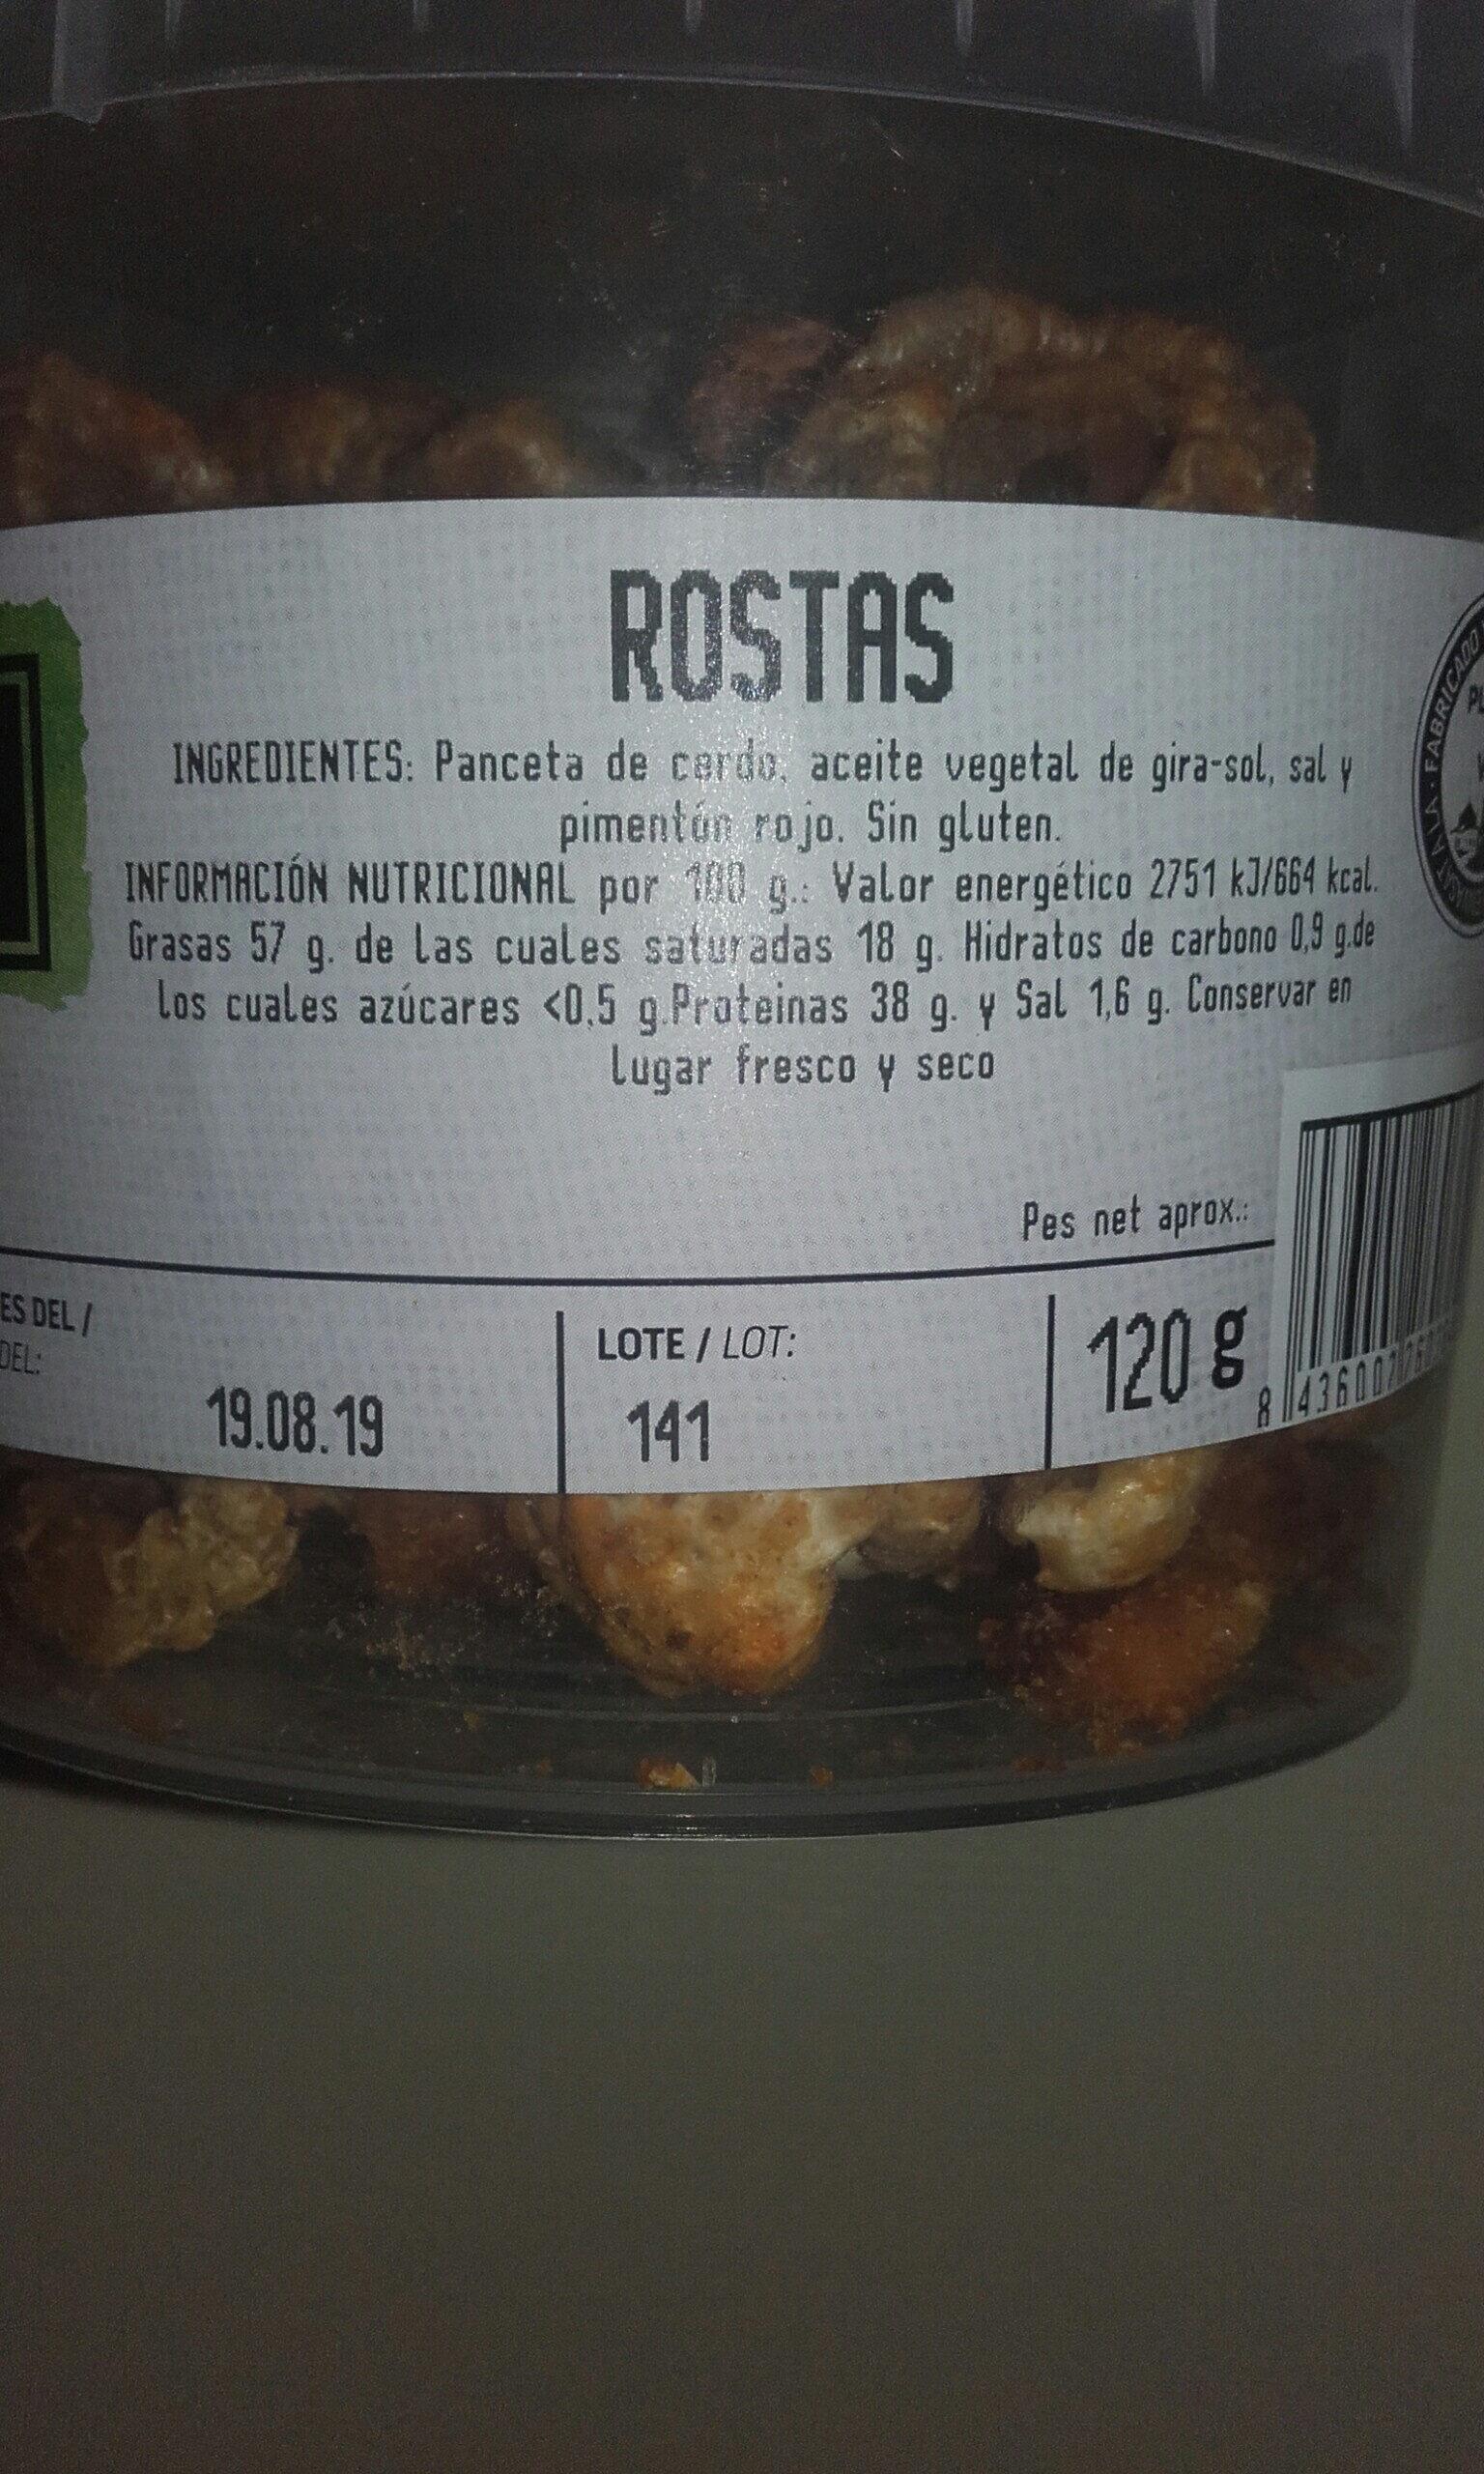 rostas - Ingredients